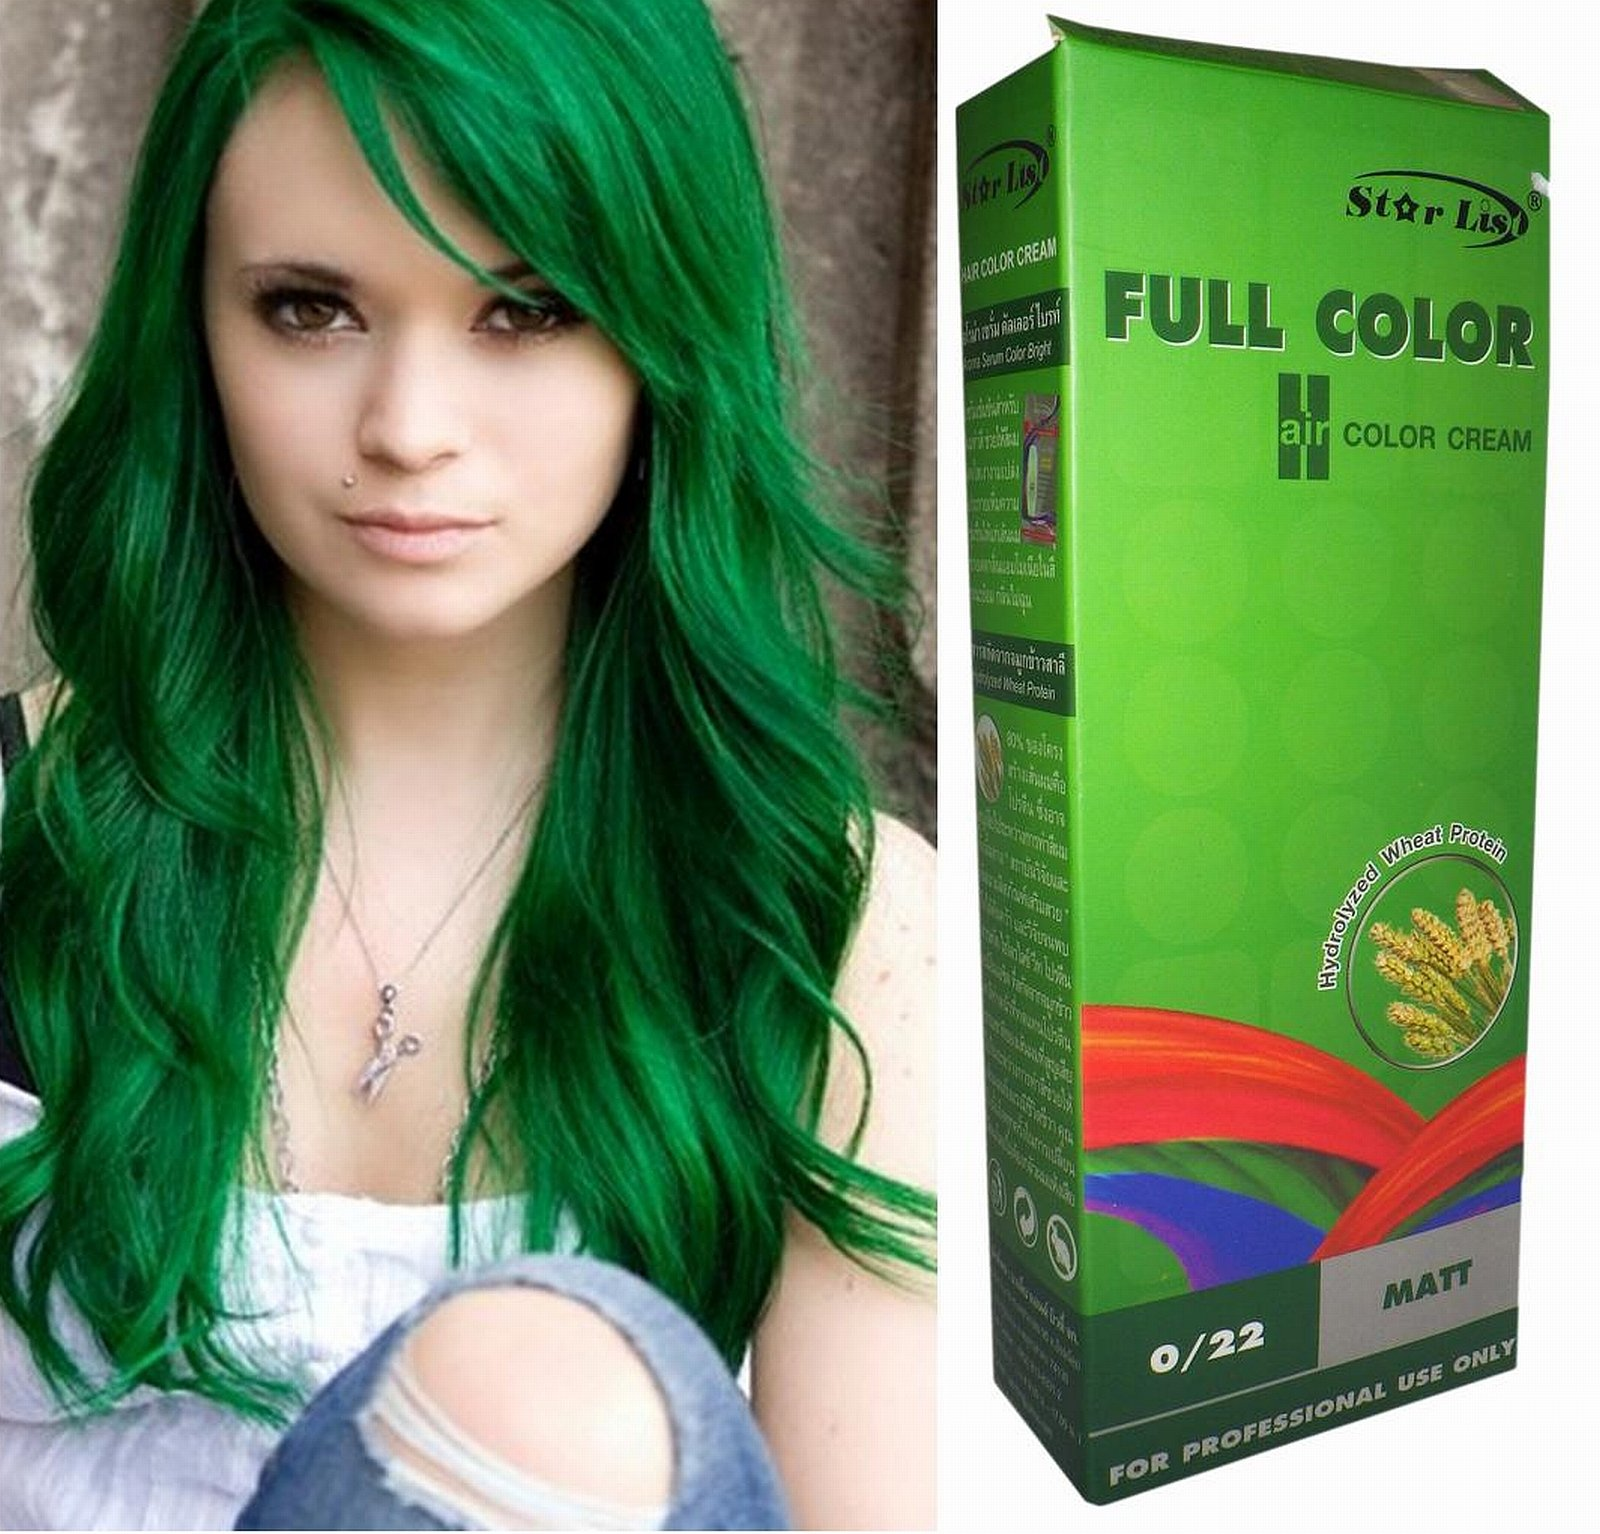 Amazon Premium Permanent Hair Color Cream Dye Goth Cosplay Emo